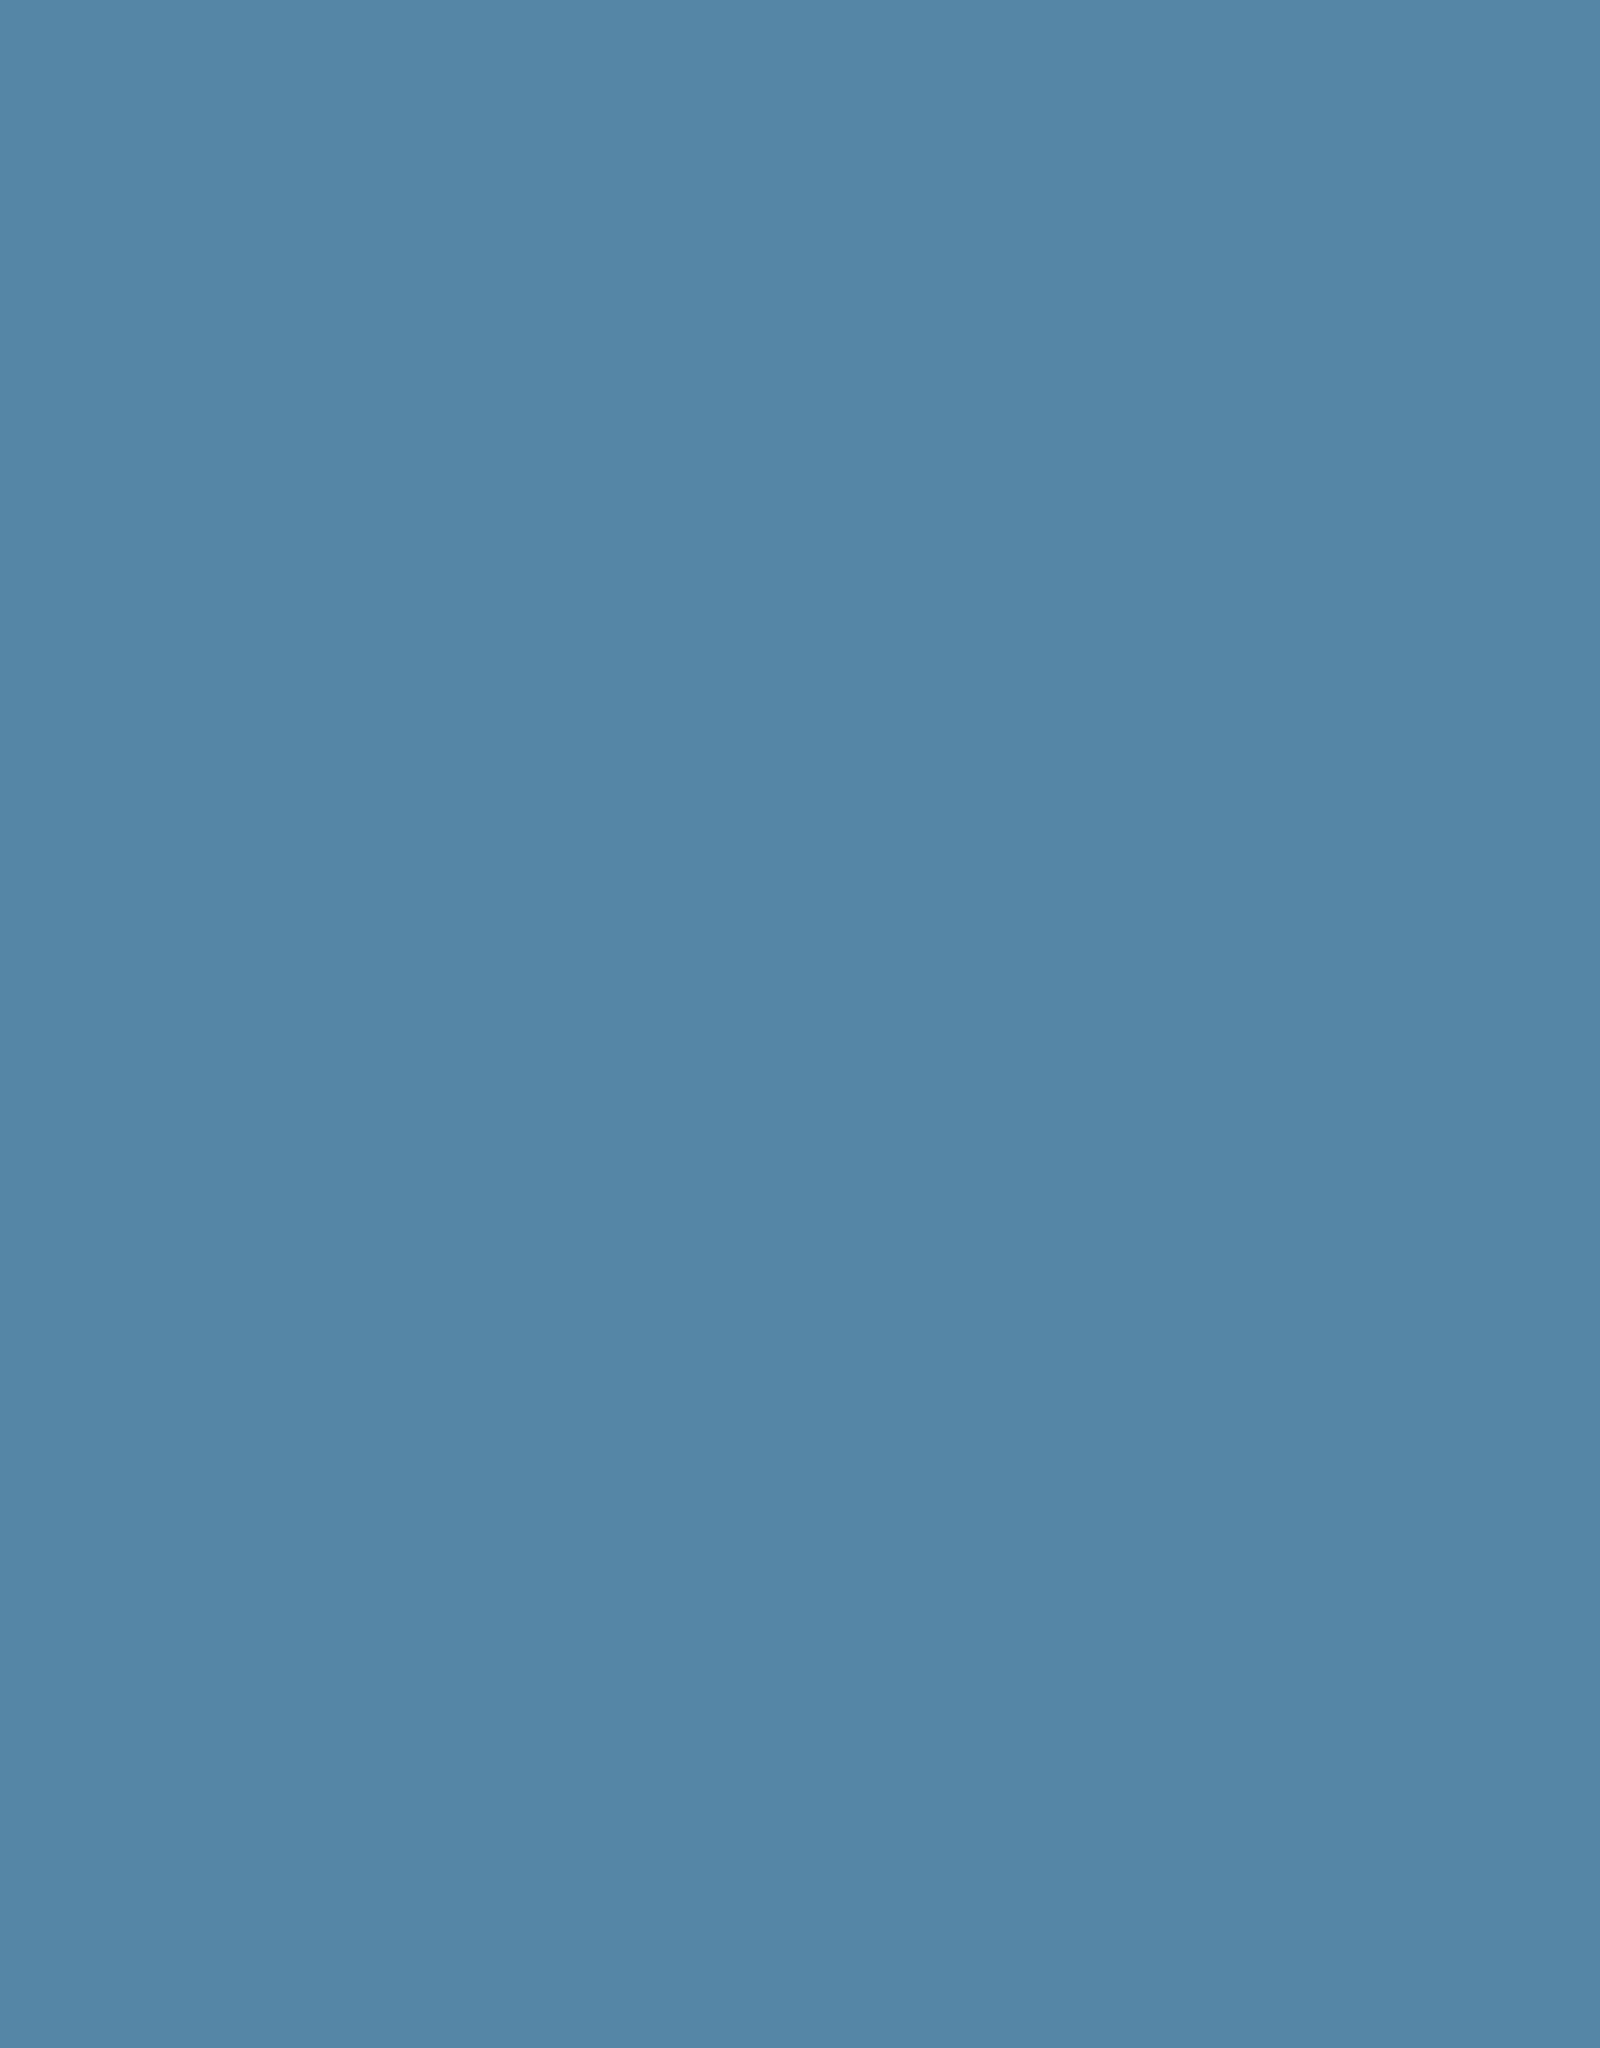 Superior Seamless Superior Seamless 4' Marine Blue #41